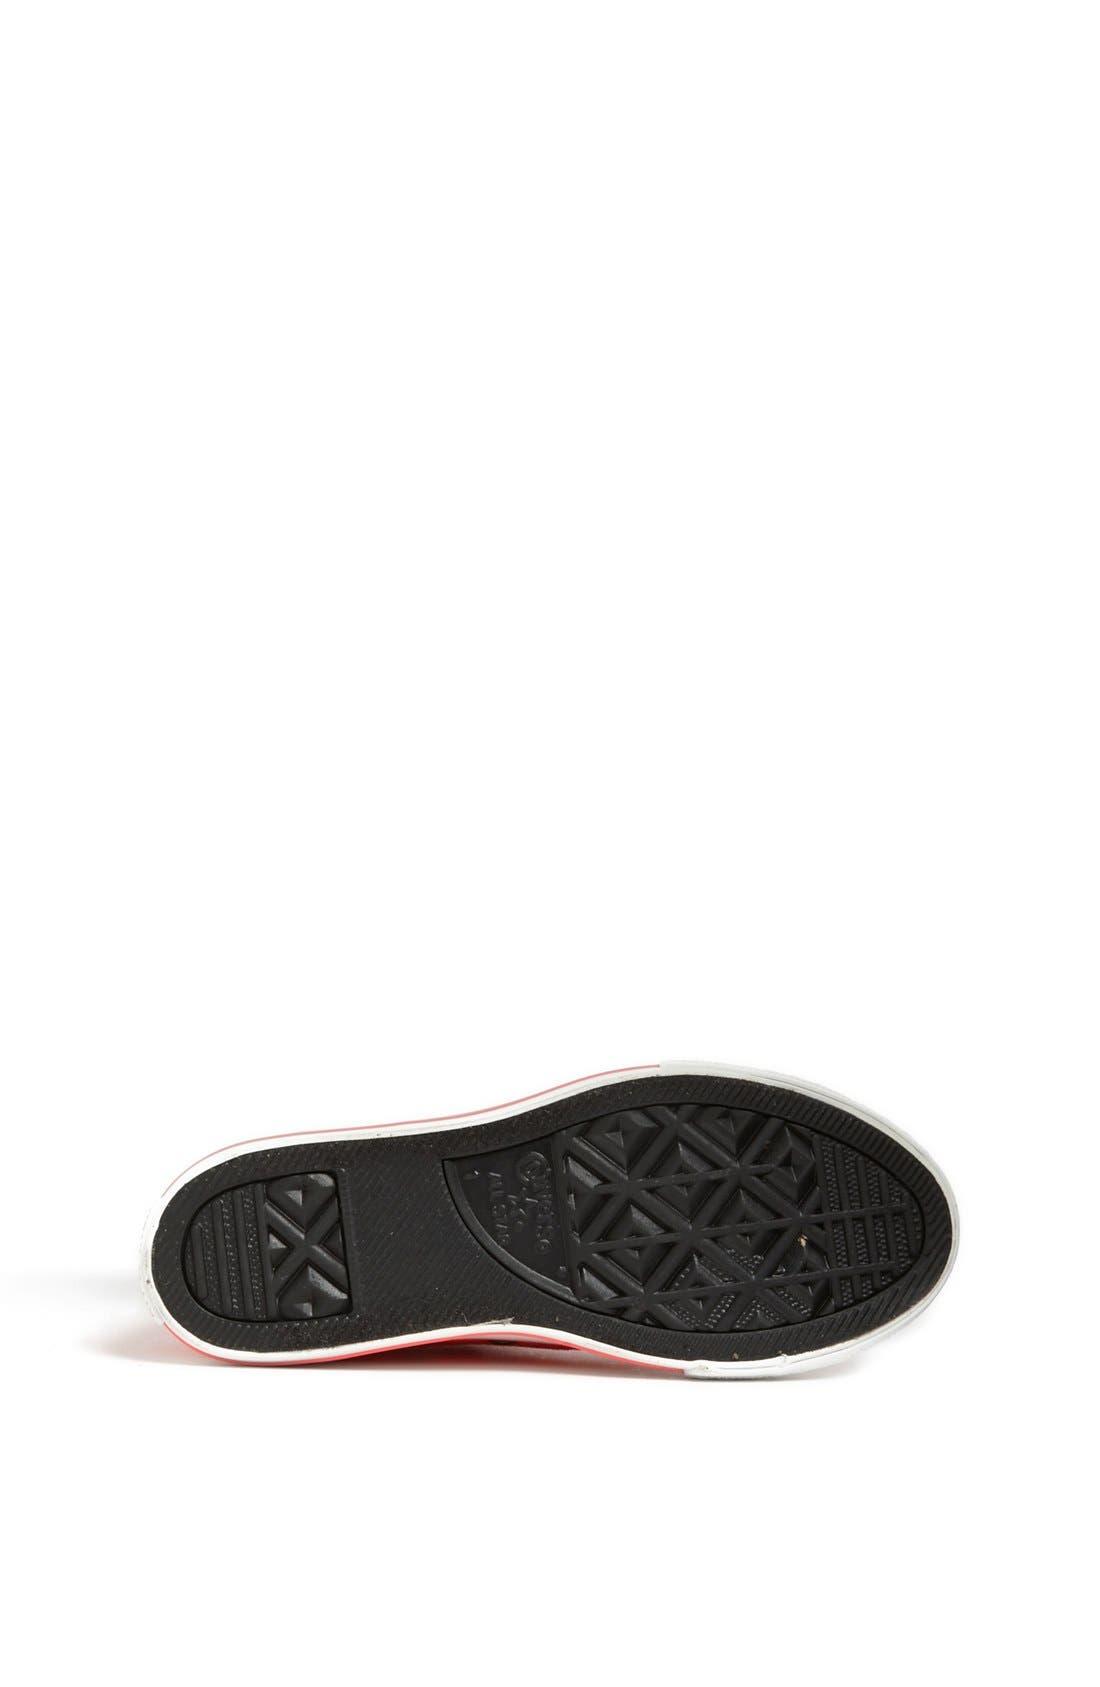 Alternate Image 4  - Converse Chuck Taylor® All Star® High Top Sneaker (Toddler, Little Kid & Big Kid)